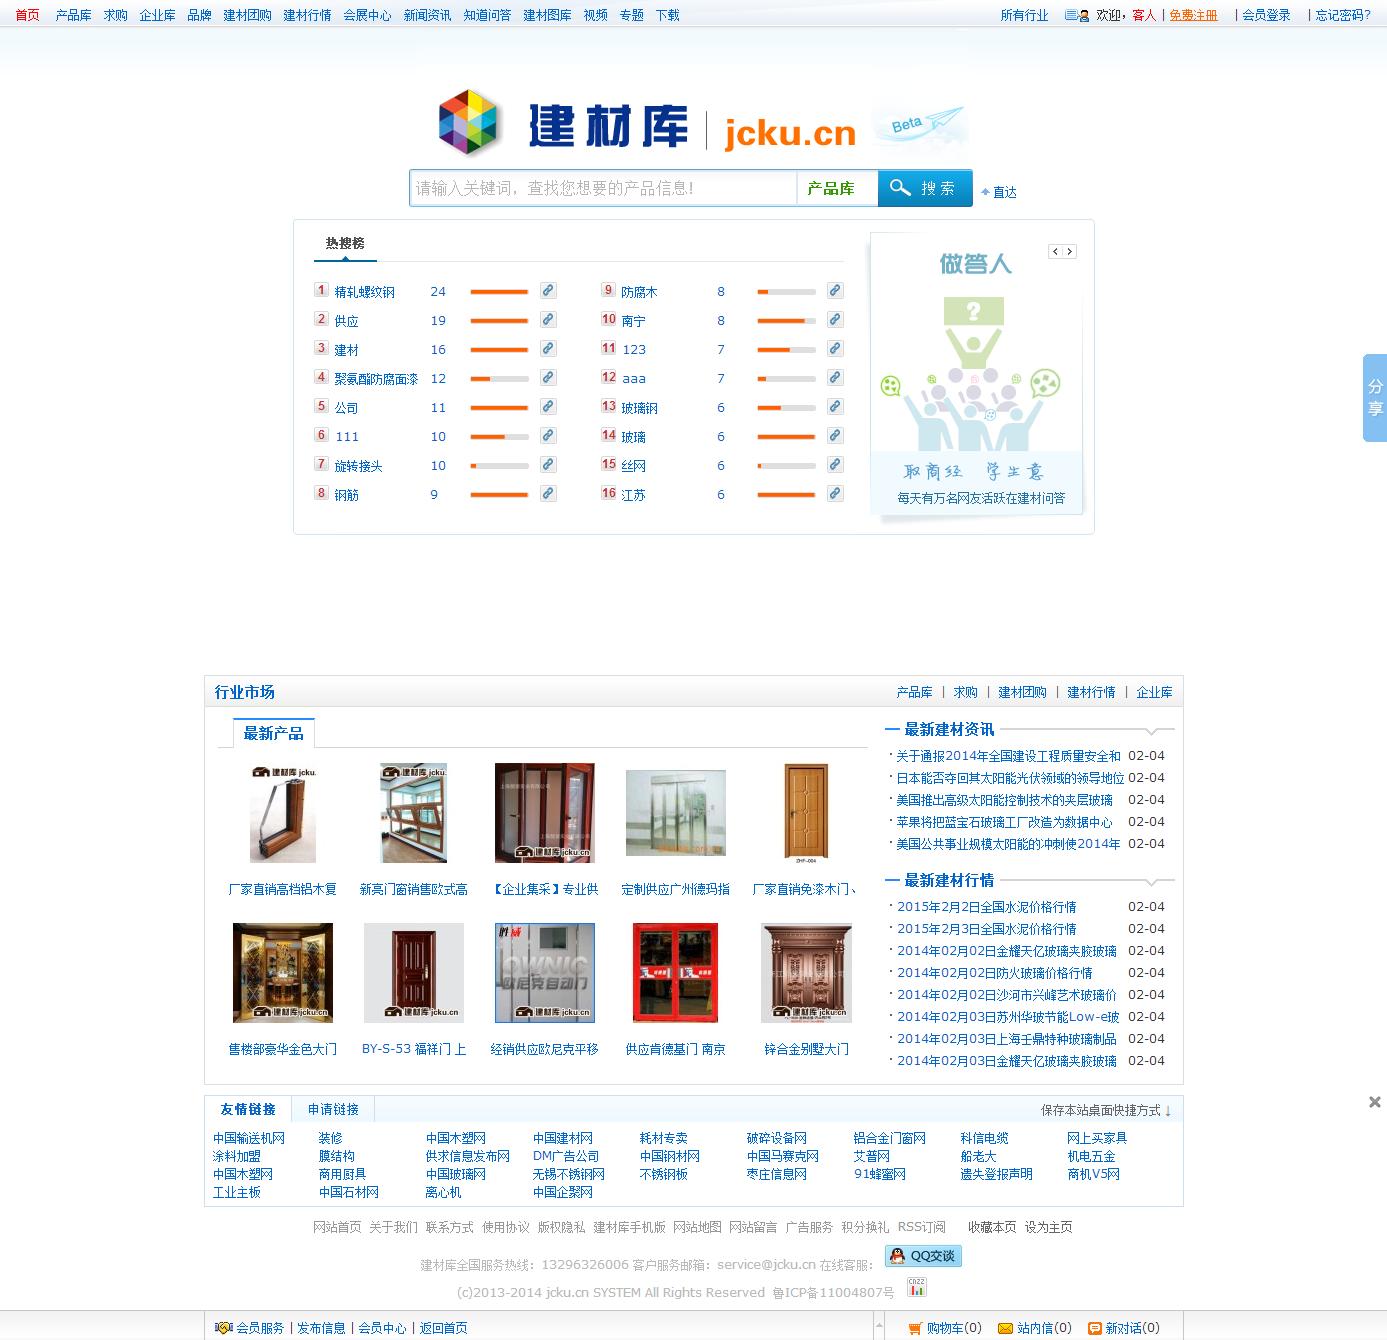 Destoon6.0模板仿铭万必途B2B搜索平台源码,内附安装说明